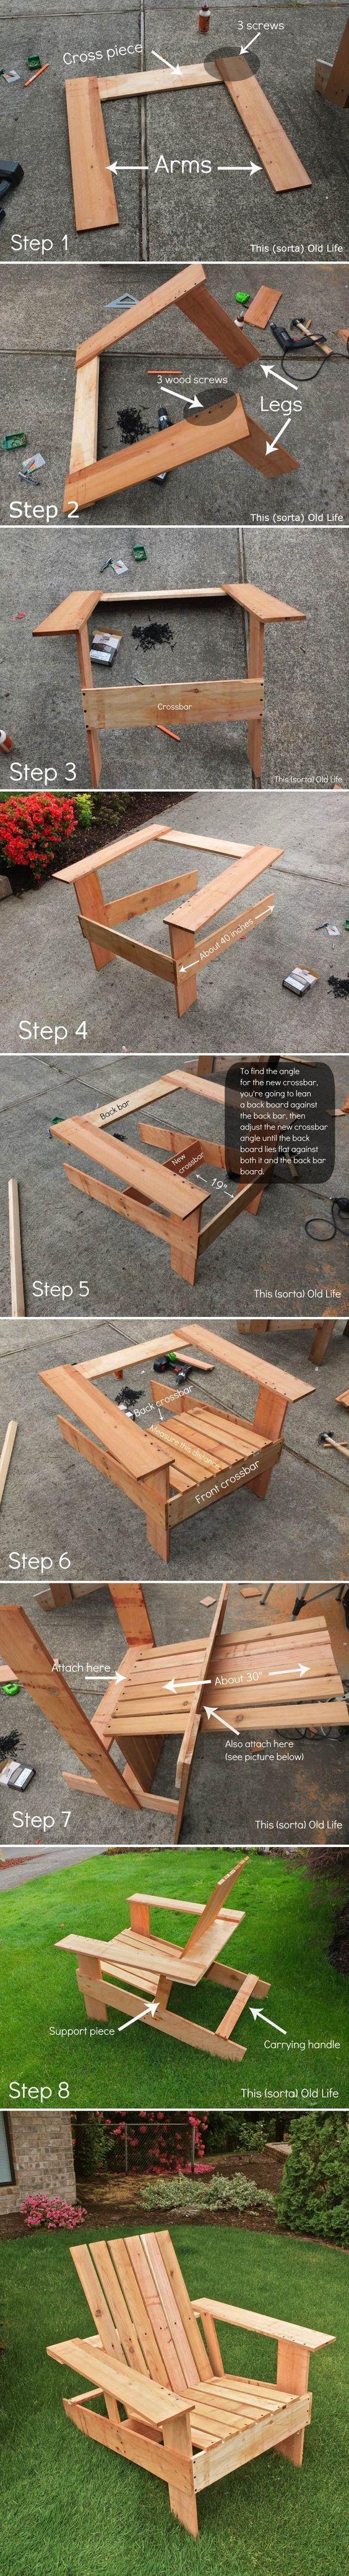 how to build an adirondack chair plans u ideas easy diy